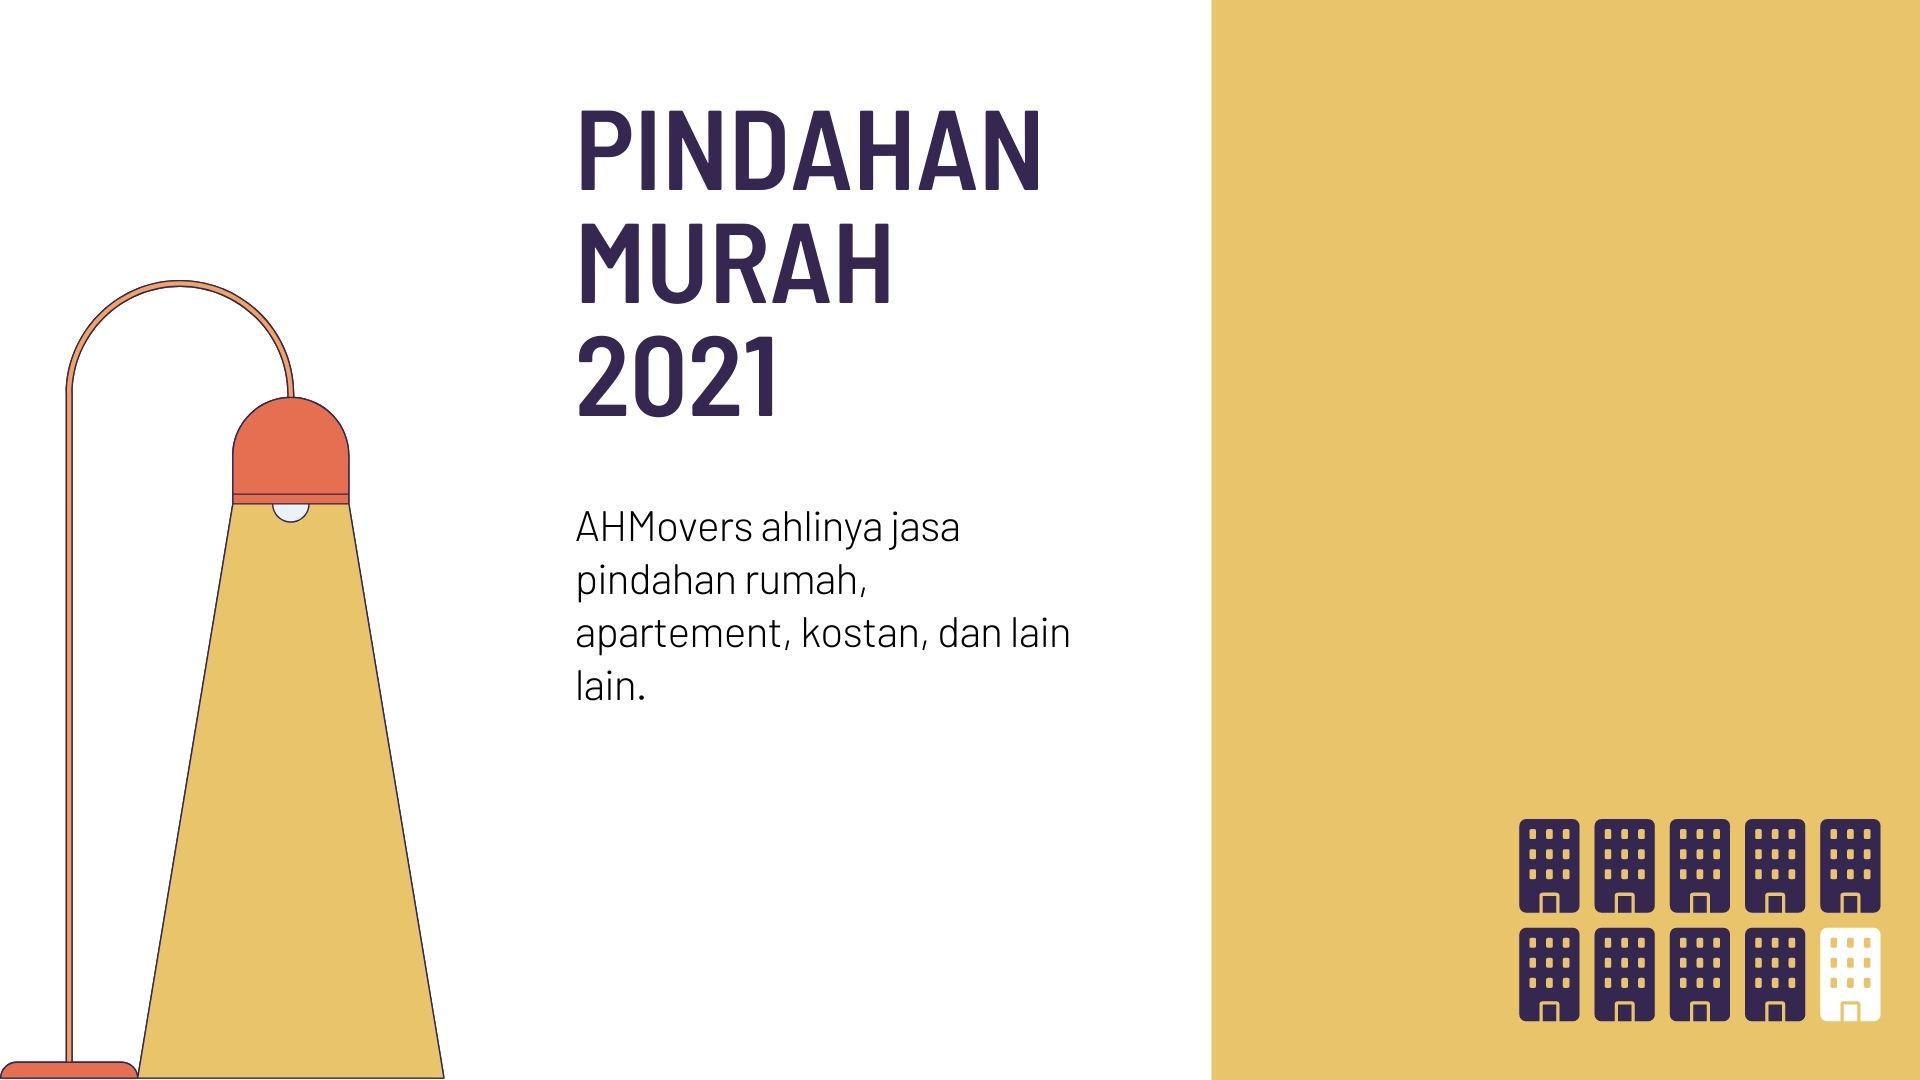 Pindahan Murah 2021